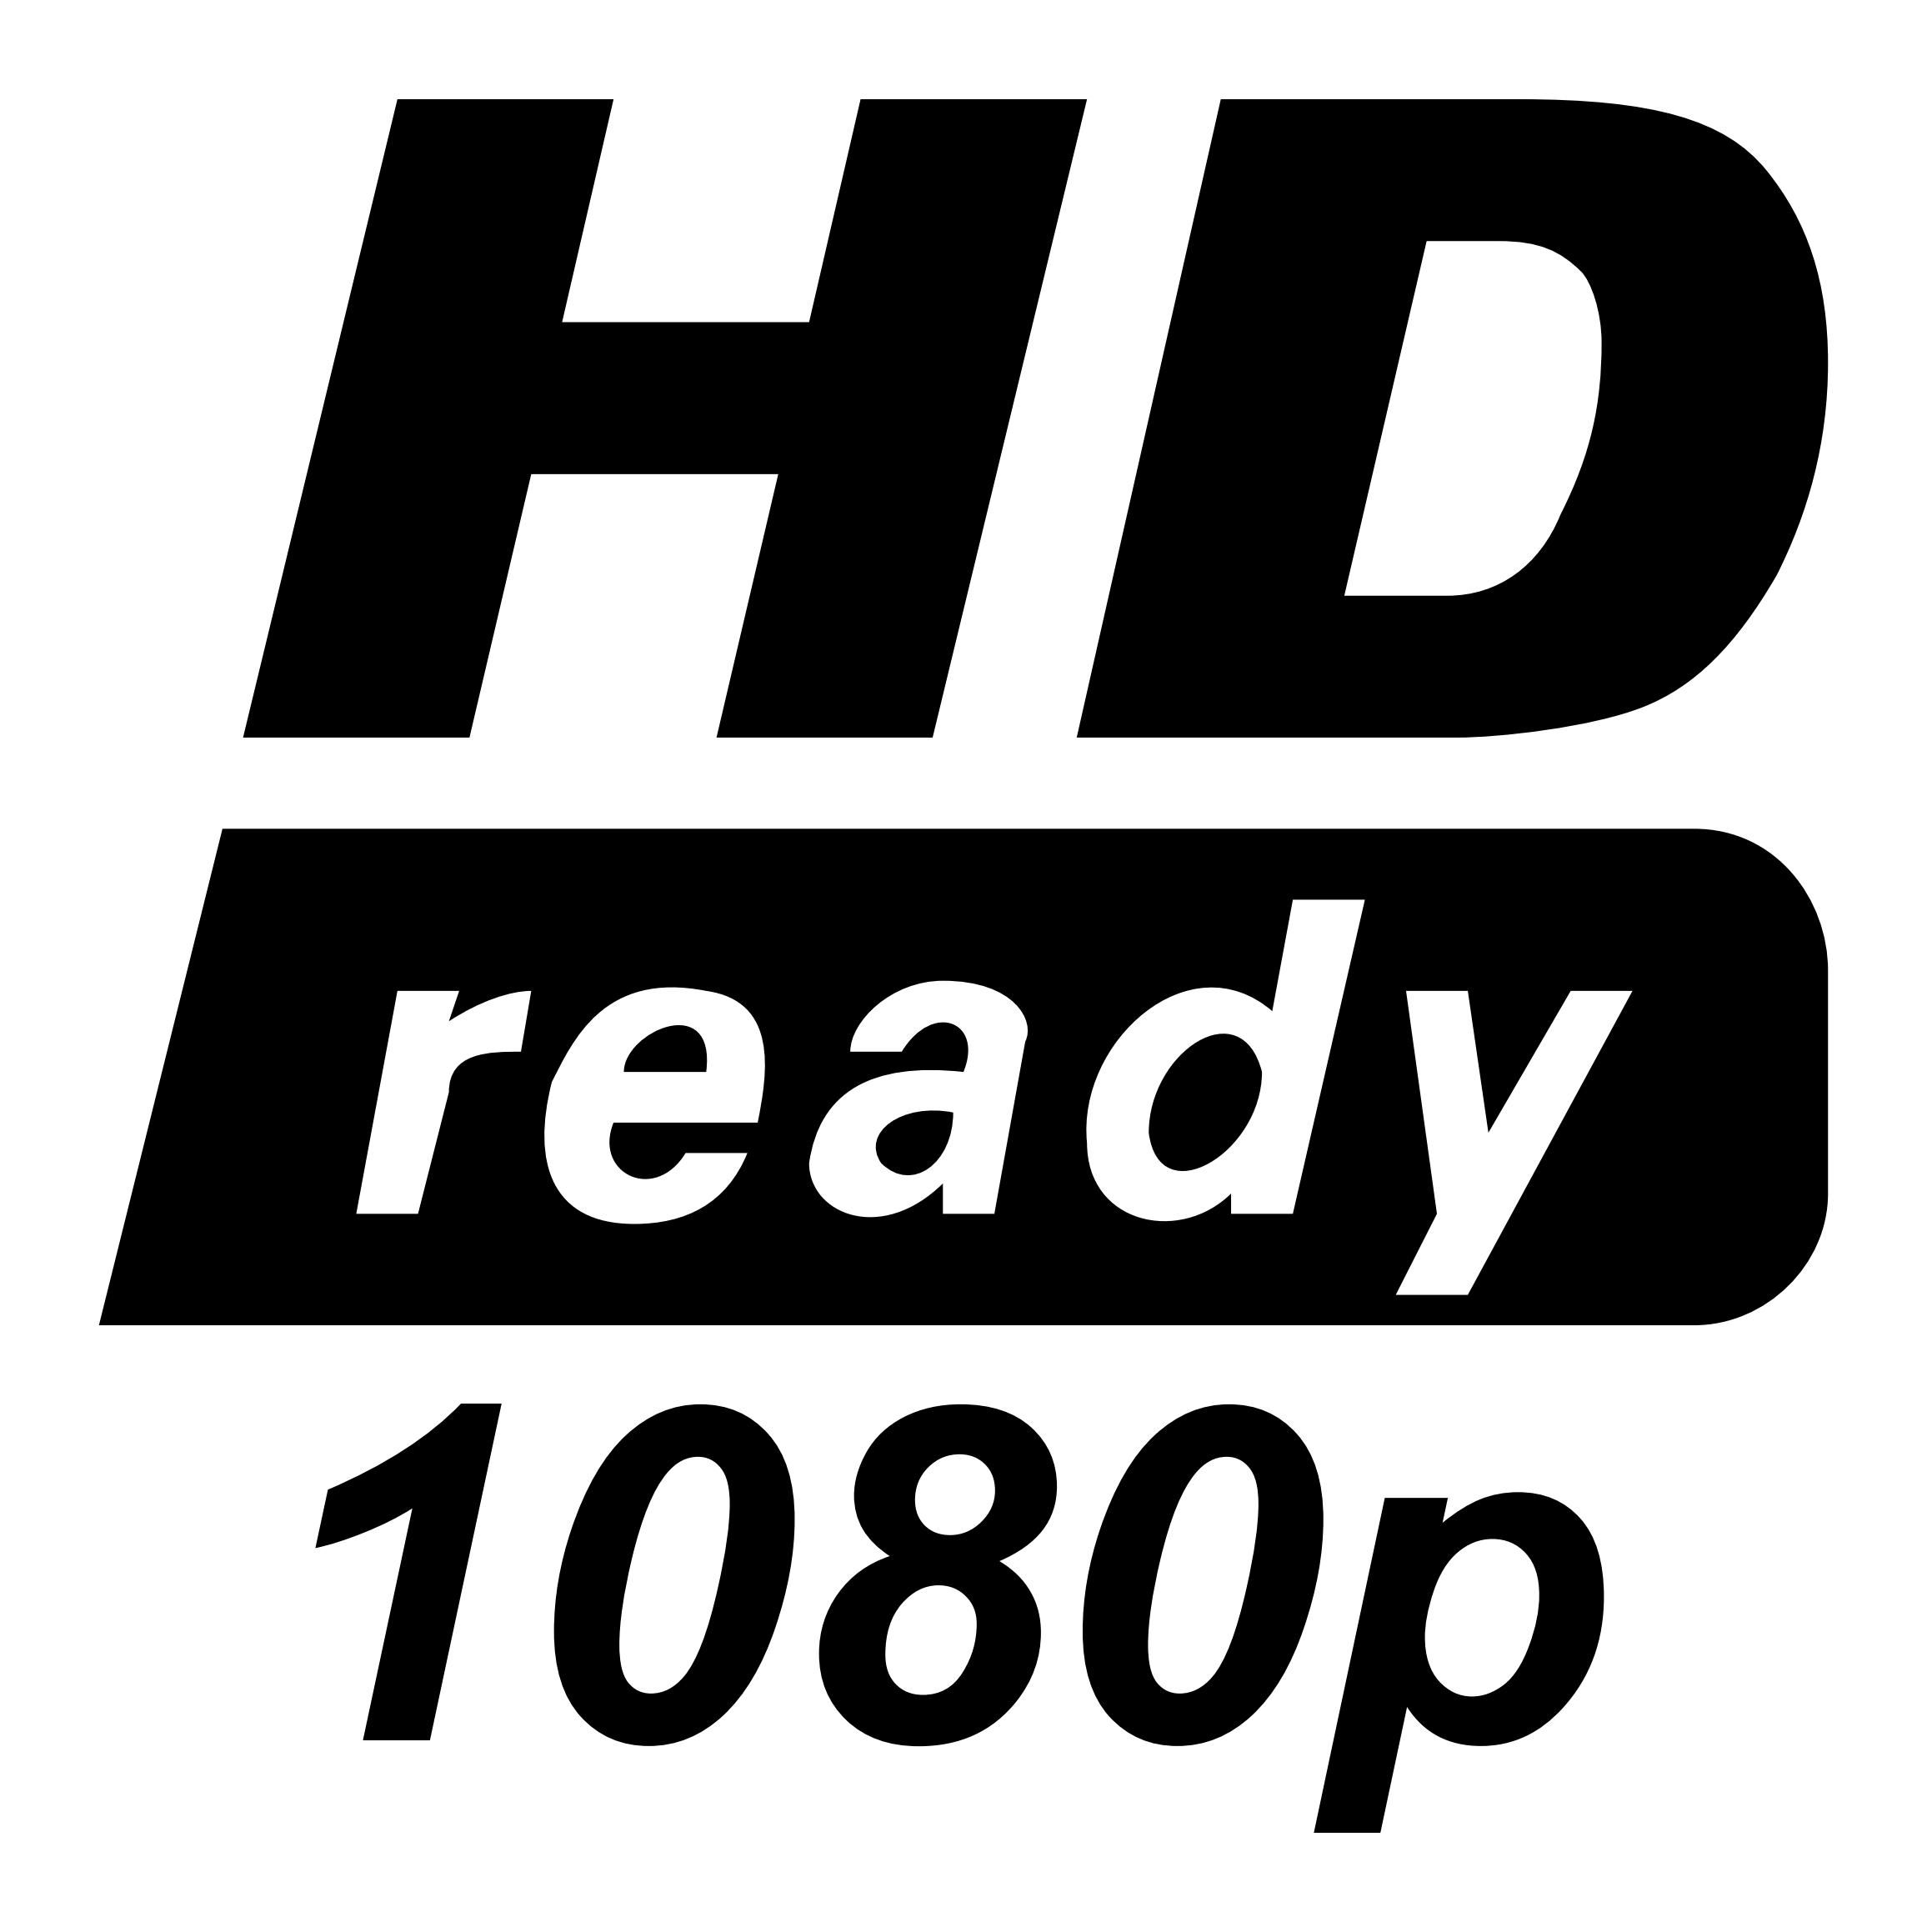 HD and HDTV Logos(이미지 포함)